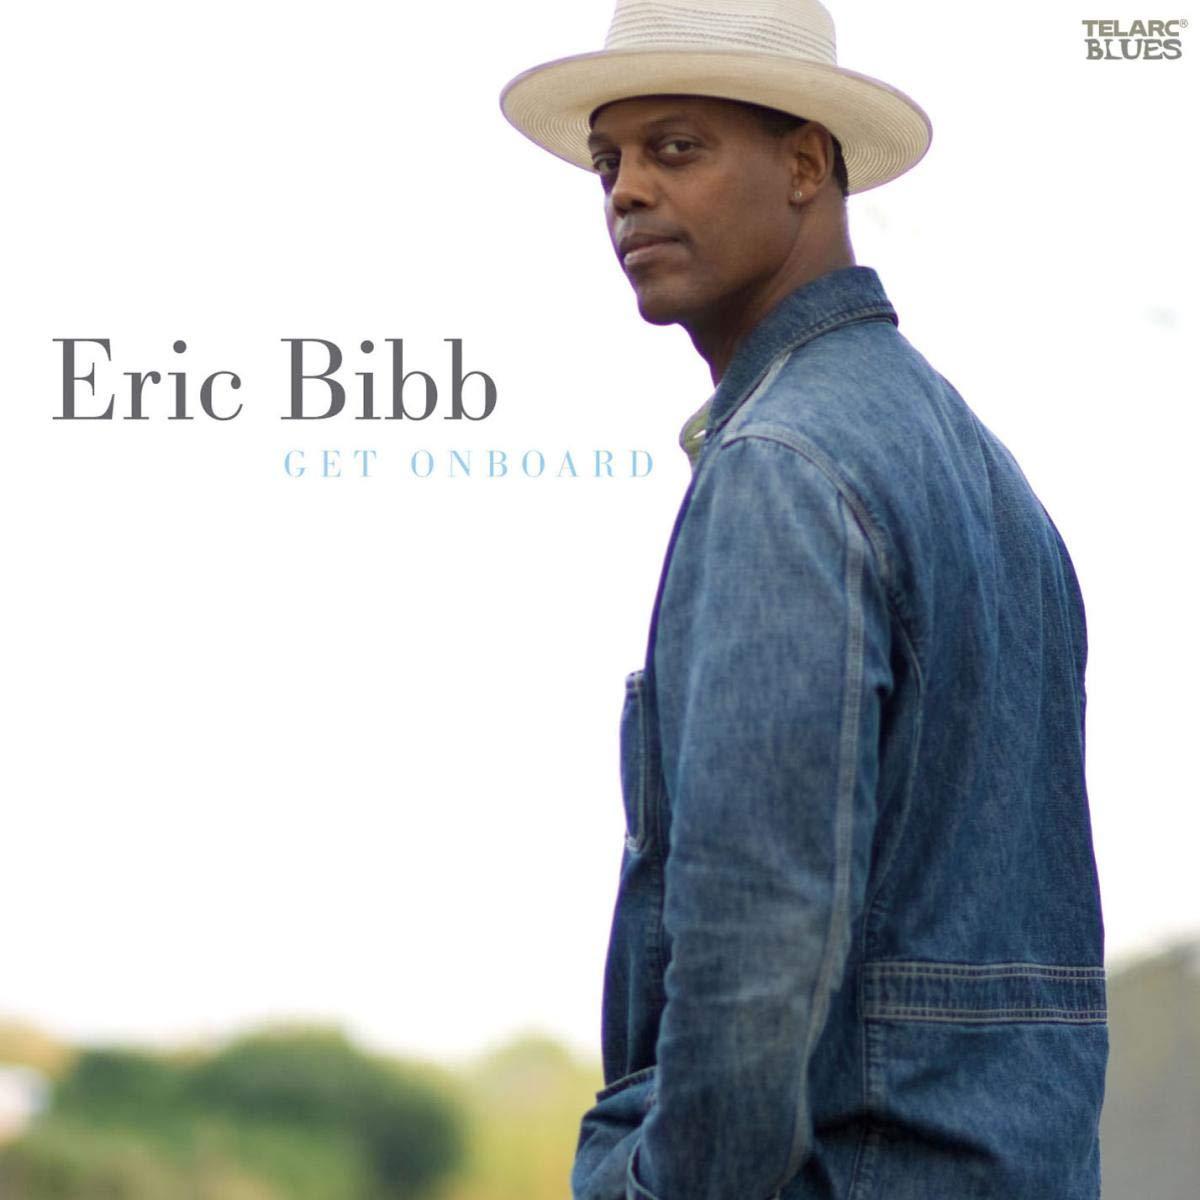 Eric Bibb - Get Onboard (2008) [FLAC] Download